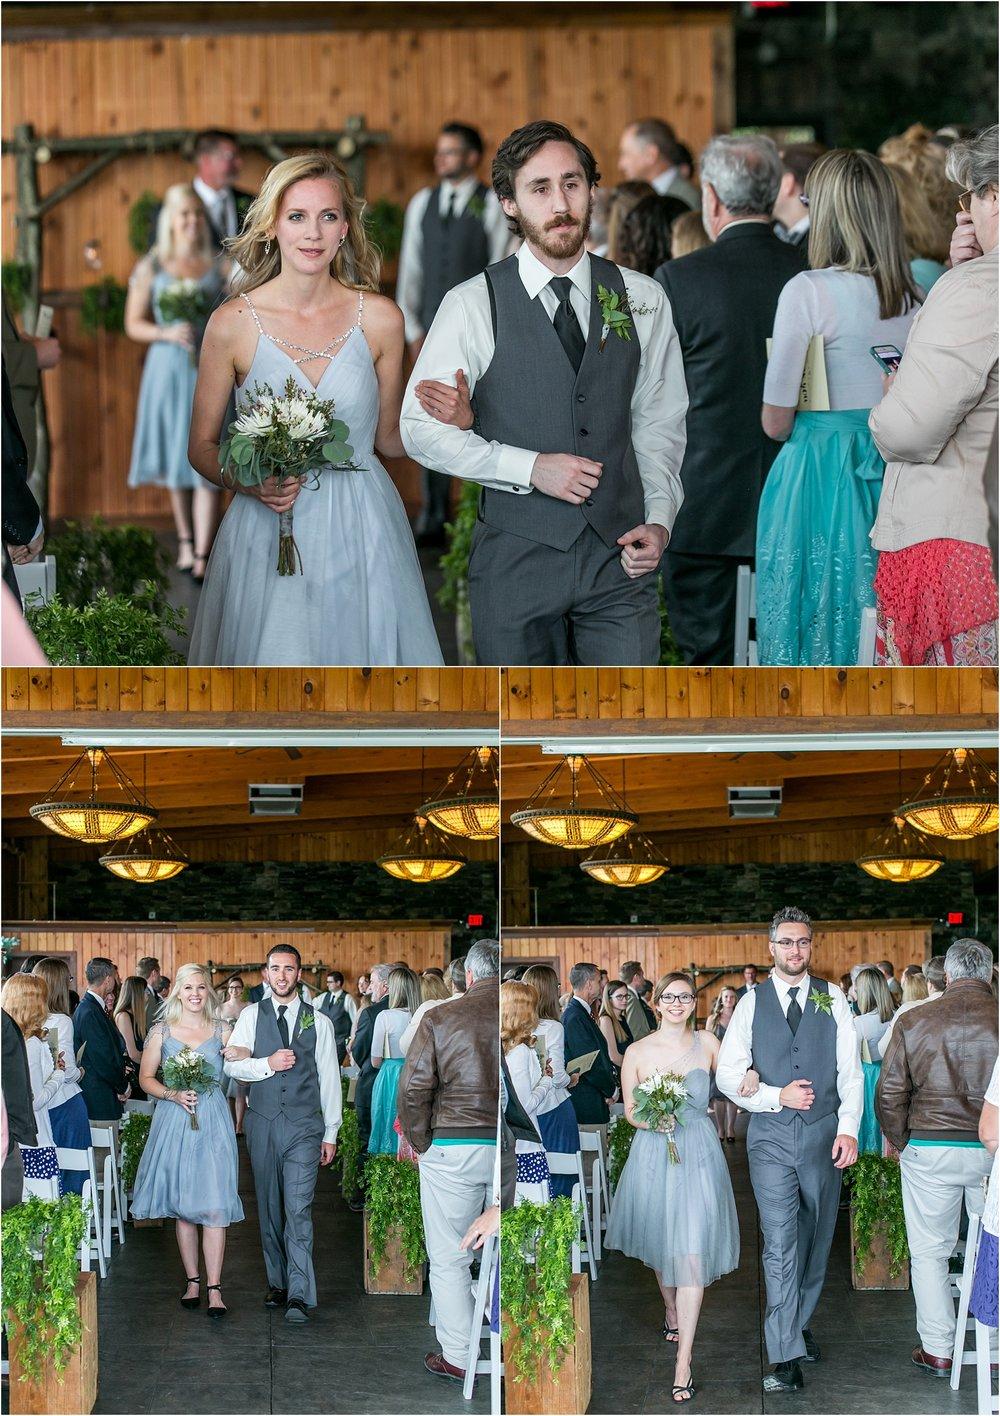 Smith Wedding Liberty Forge Golf Course Wedding Living Radiant Photography Photos_0077.jpg